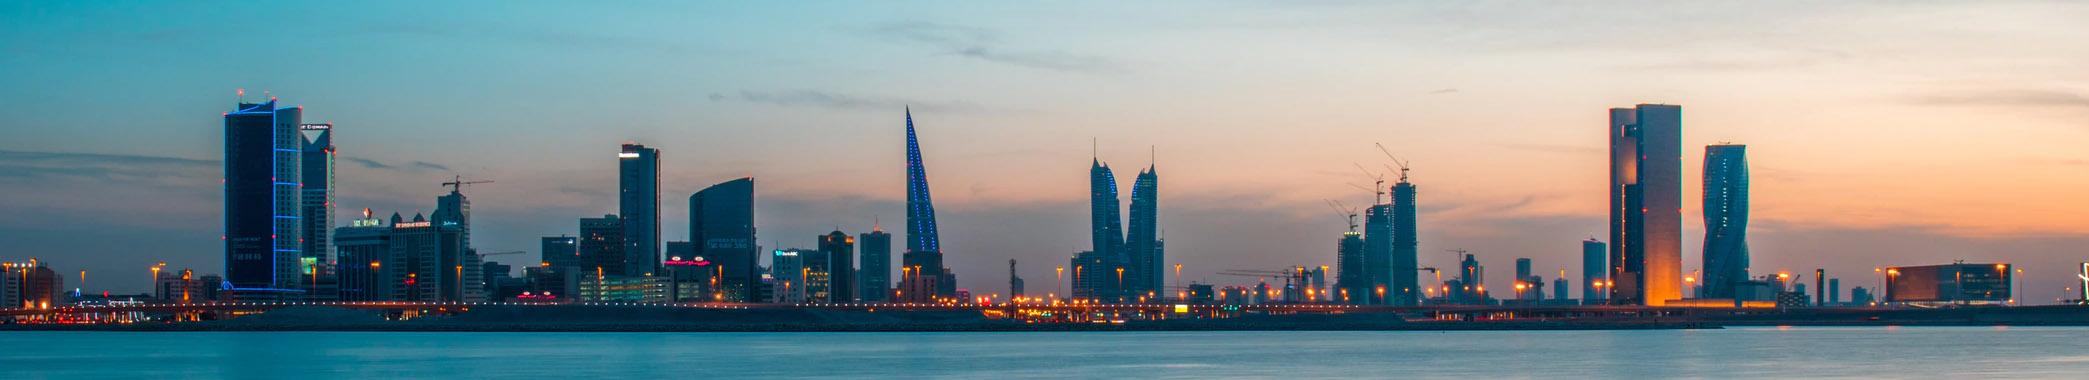 How to get investor visa in bahrain